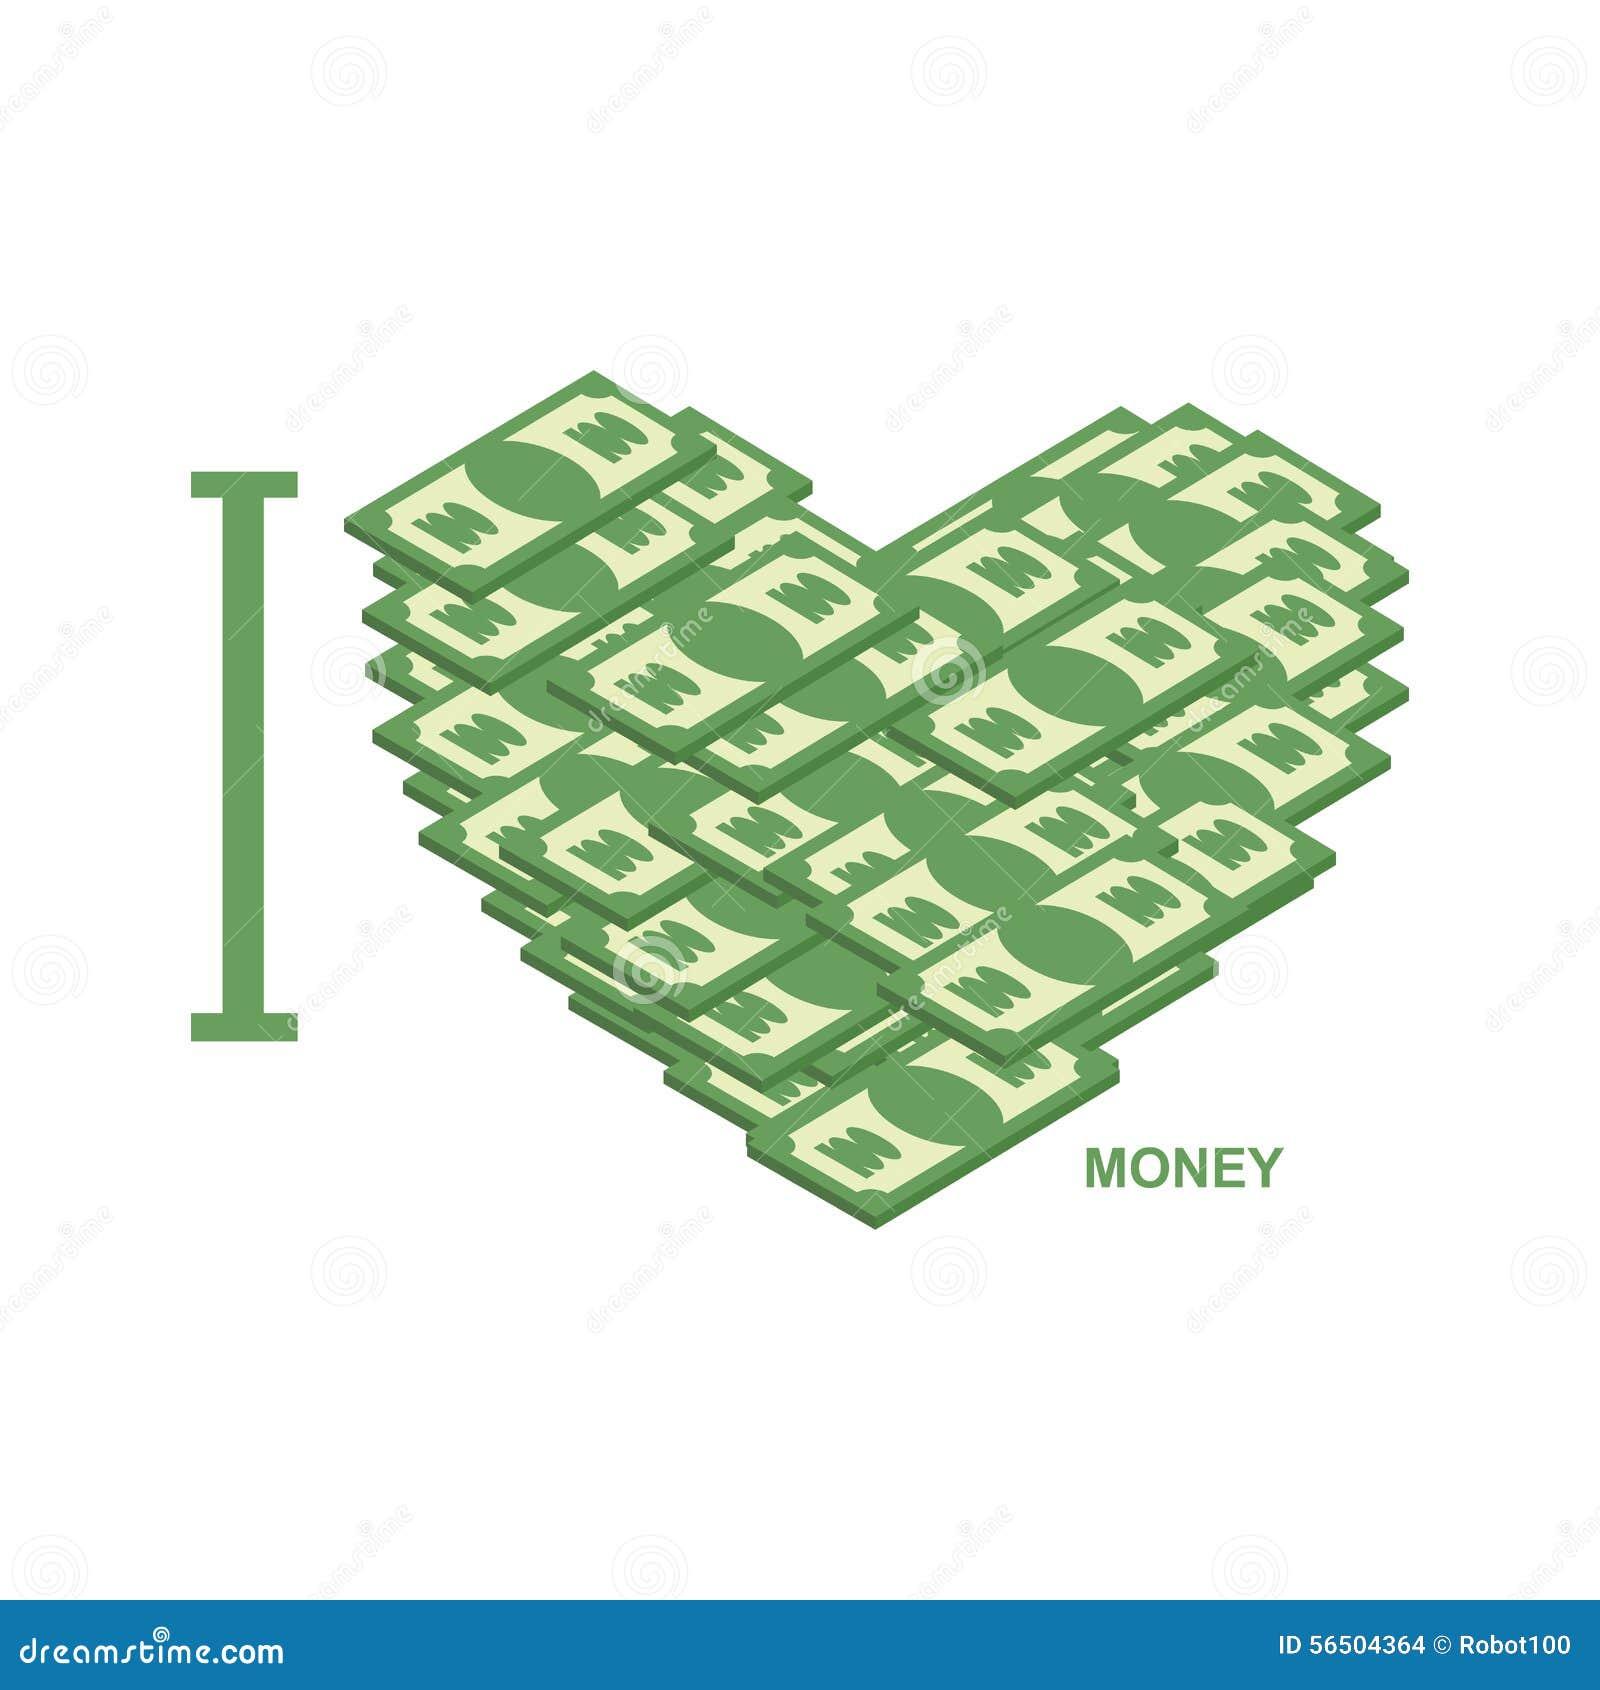 I Love Money Symbol Of Heart Of Dollars Illustration Of Cash T